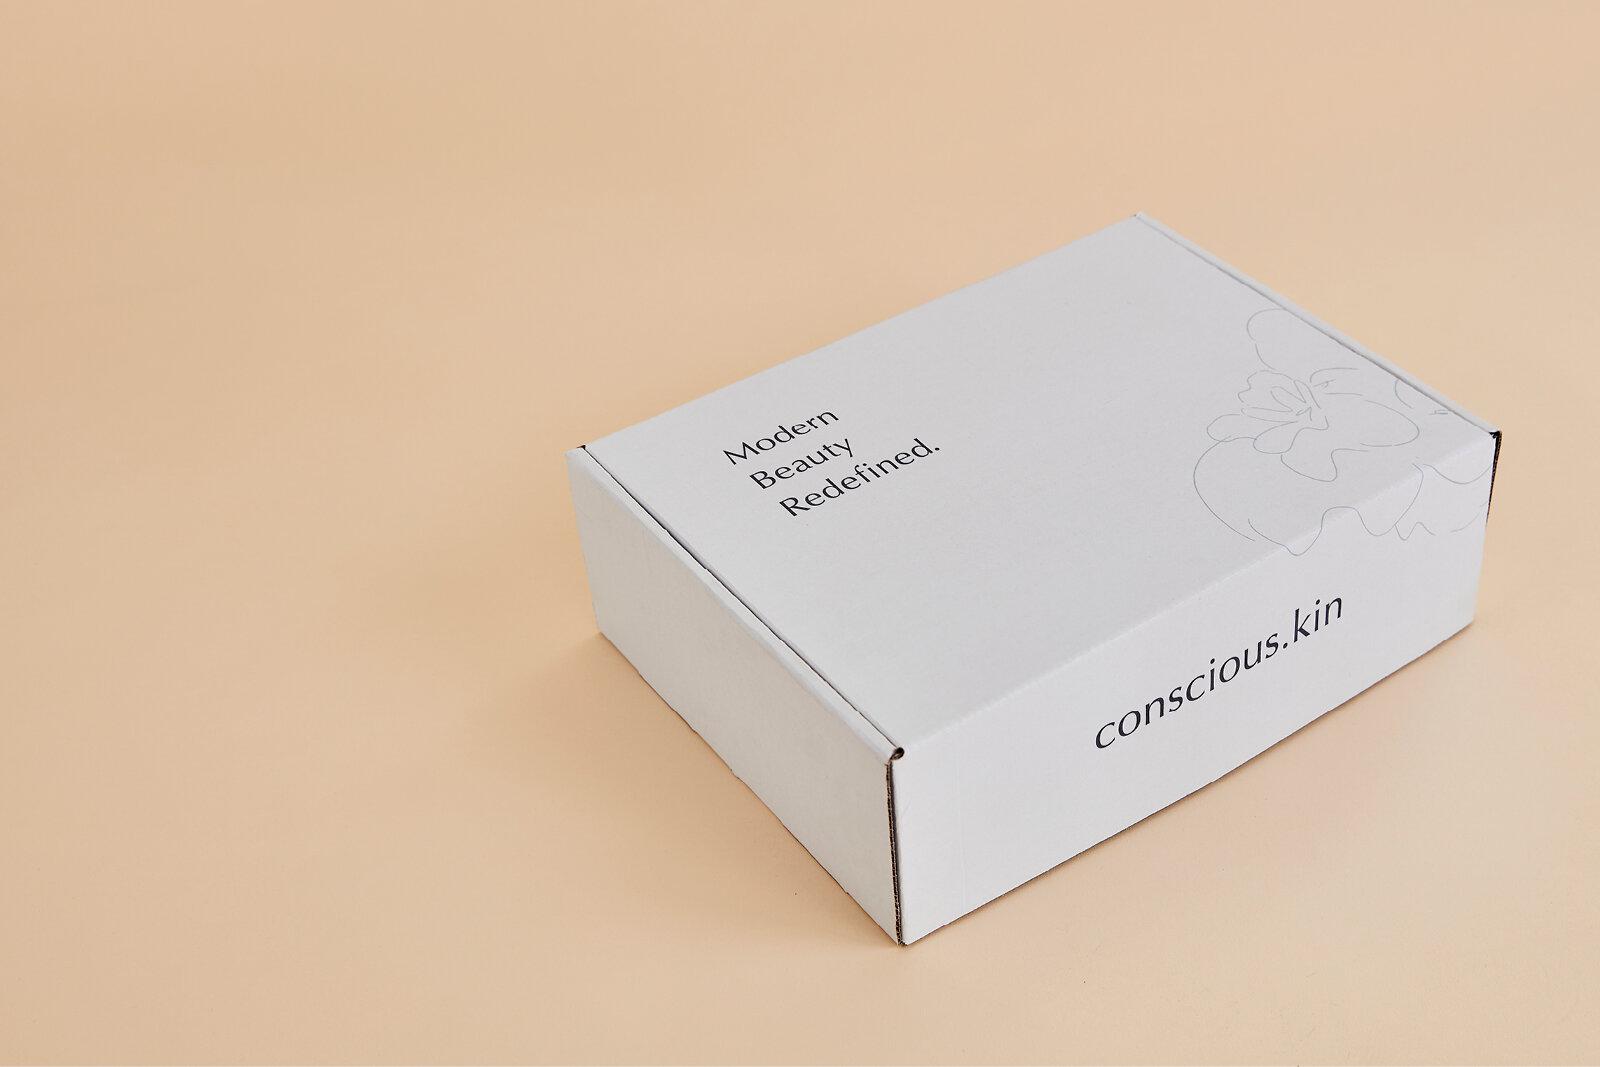 Conscious_Kin_Packaging_Design_Eco_Boutique_Studio_Brisbane_Graphic_Design.jpg